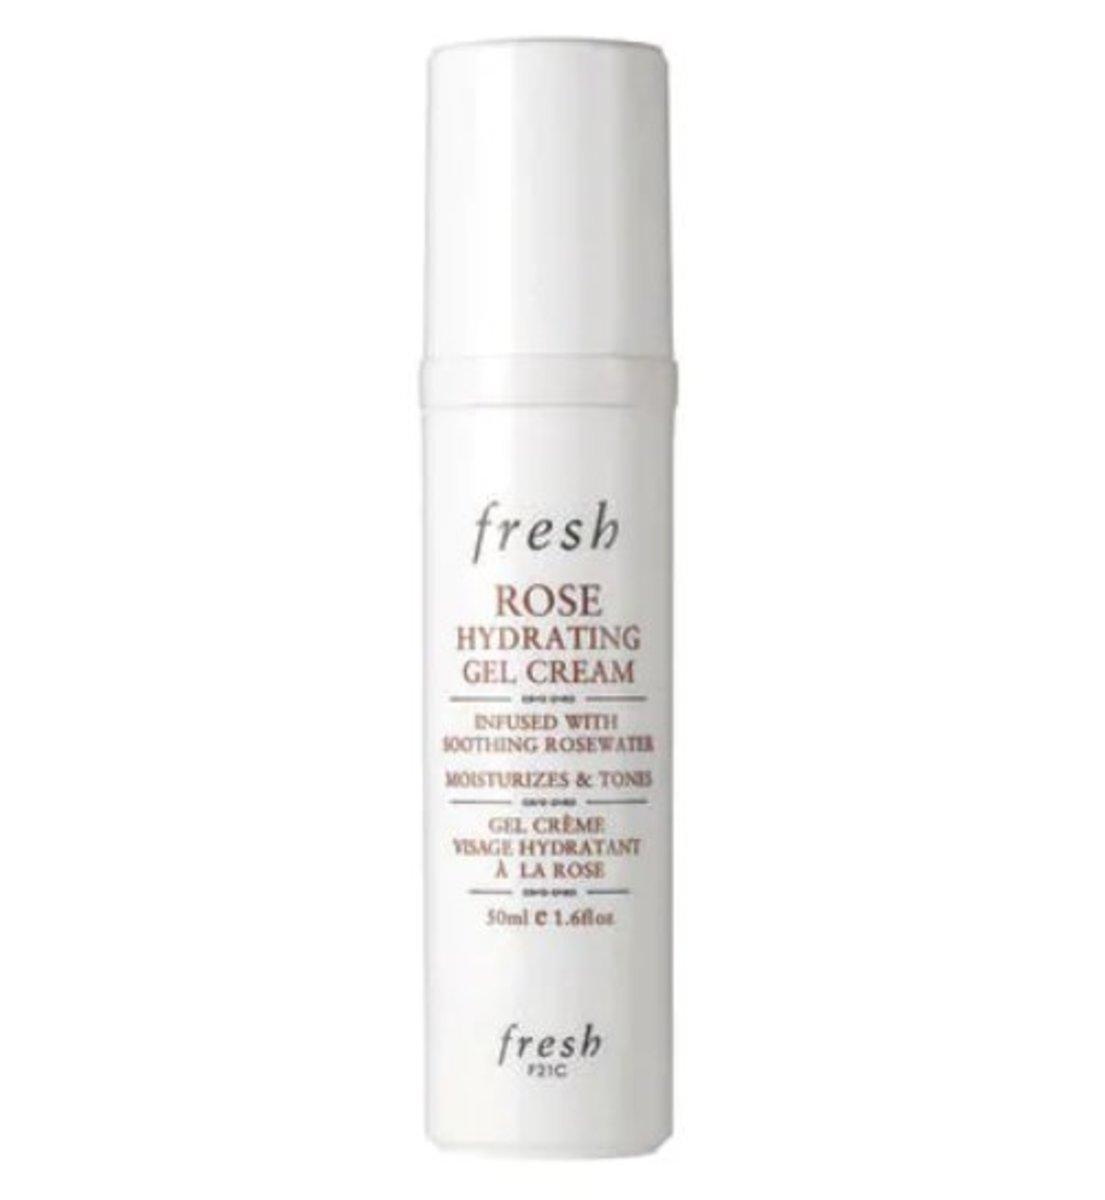 Rose Hydrating Gel Cream 50ml (Parallel Import)